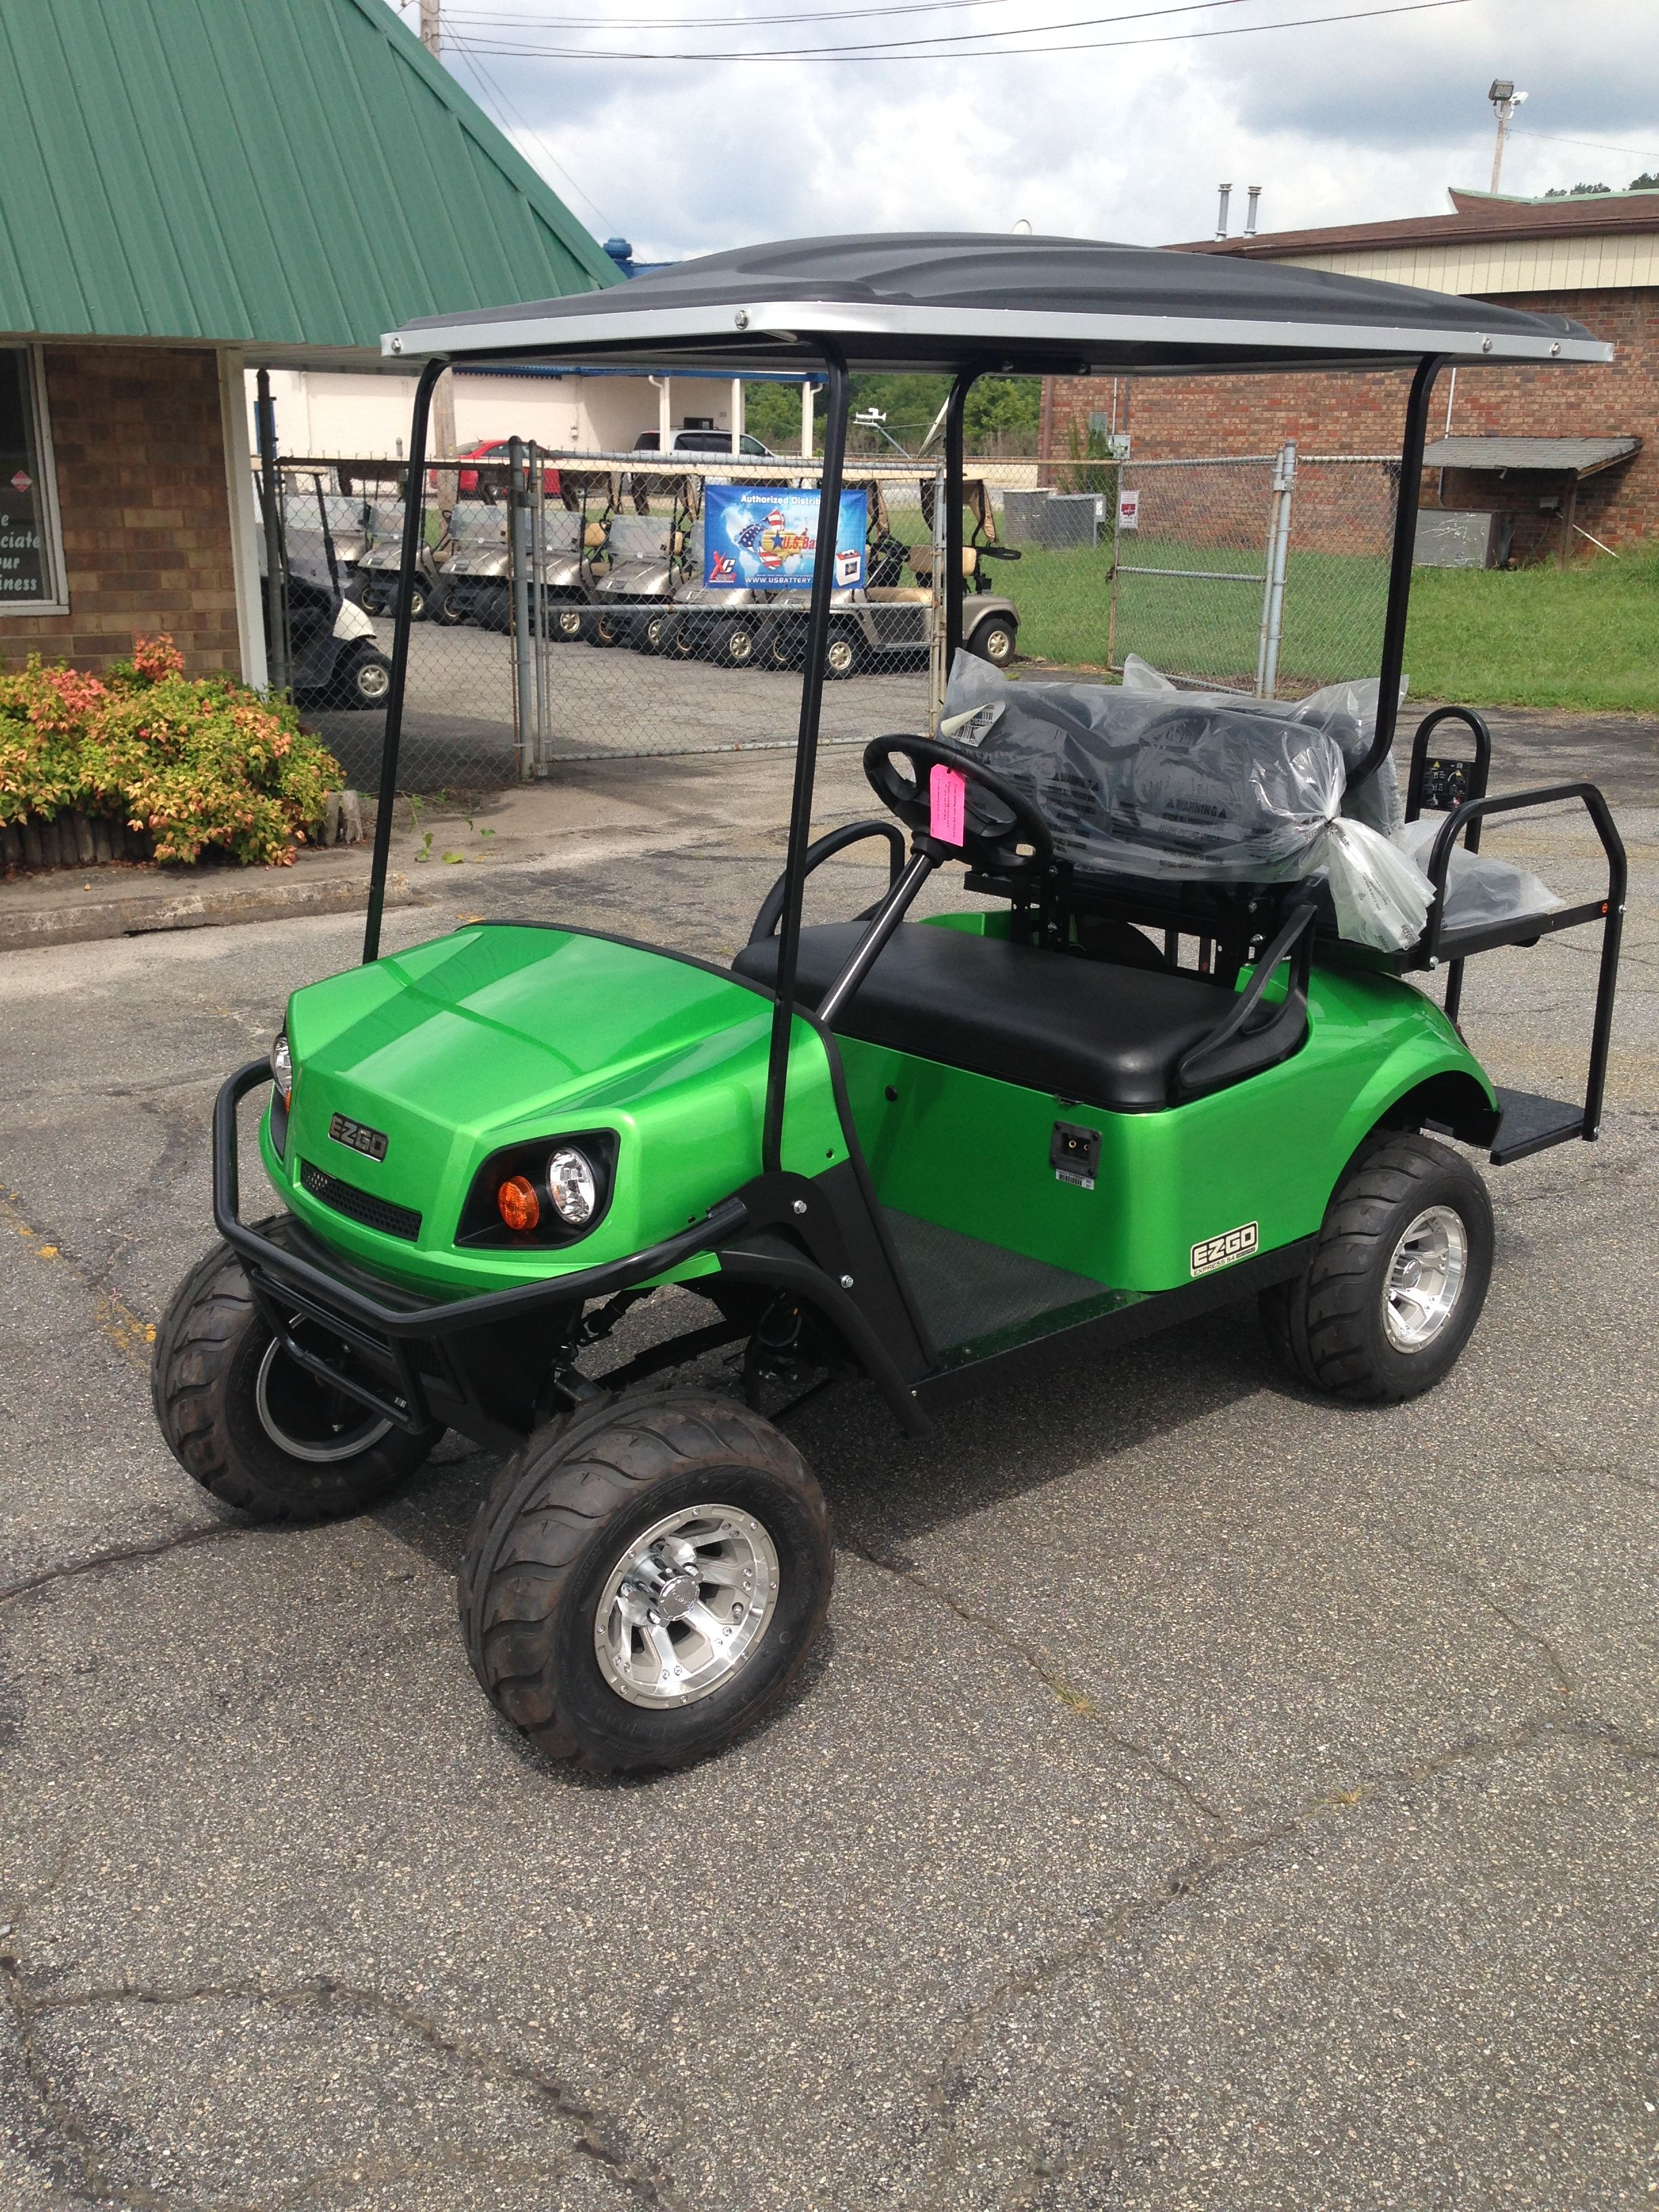 2017 E-Z-GO S-4 HIGH OUTPUT GOLF CARTS ** reduced $7700.00 ** HURRY on easy go golf carts, toro golf carts, cool golf carts, gmc golf carts, isuzu golf carts, arctic cat golf carts, yamaha golf carts, nissan golf carts, custom golf carts, 2015 golf carts, john deere golf carts, suzuki golf carts, mitsubishi golf carts, fox golf carts, carryall golf carts, club car golf carts, jacobsen golf carts, sears golf carts, used golf carts, electric golf carts,